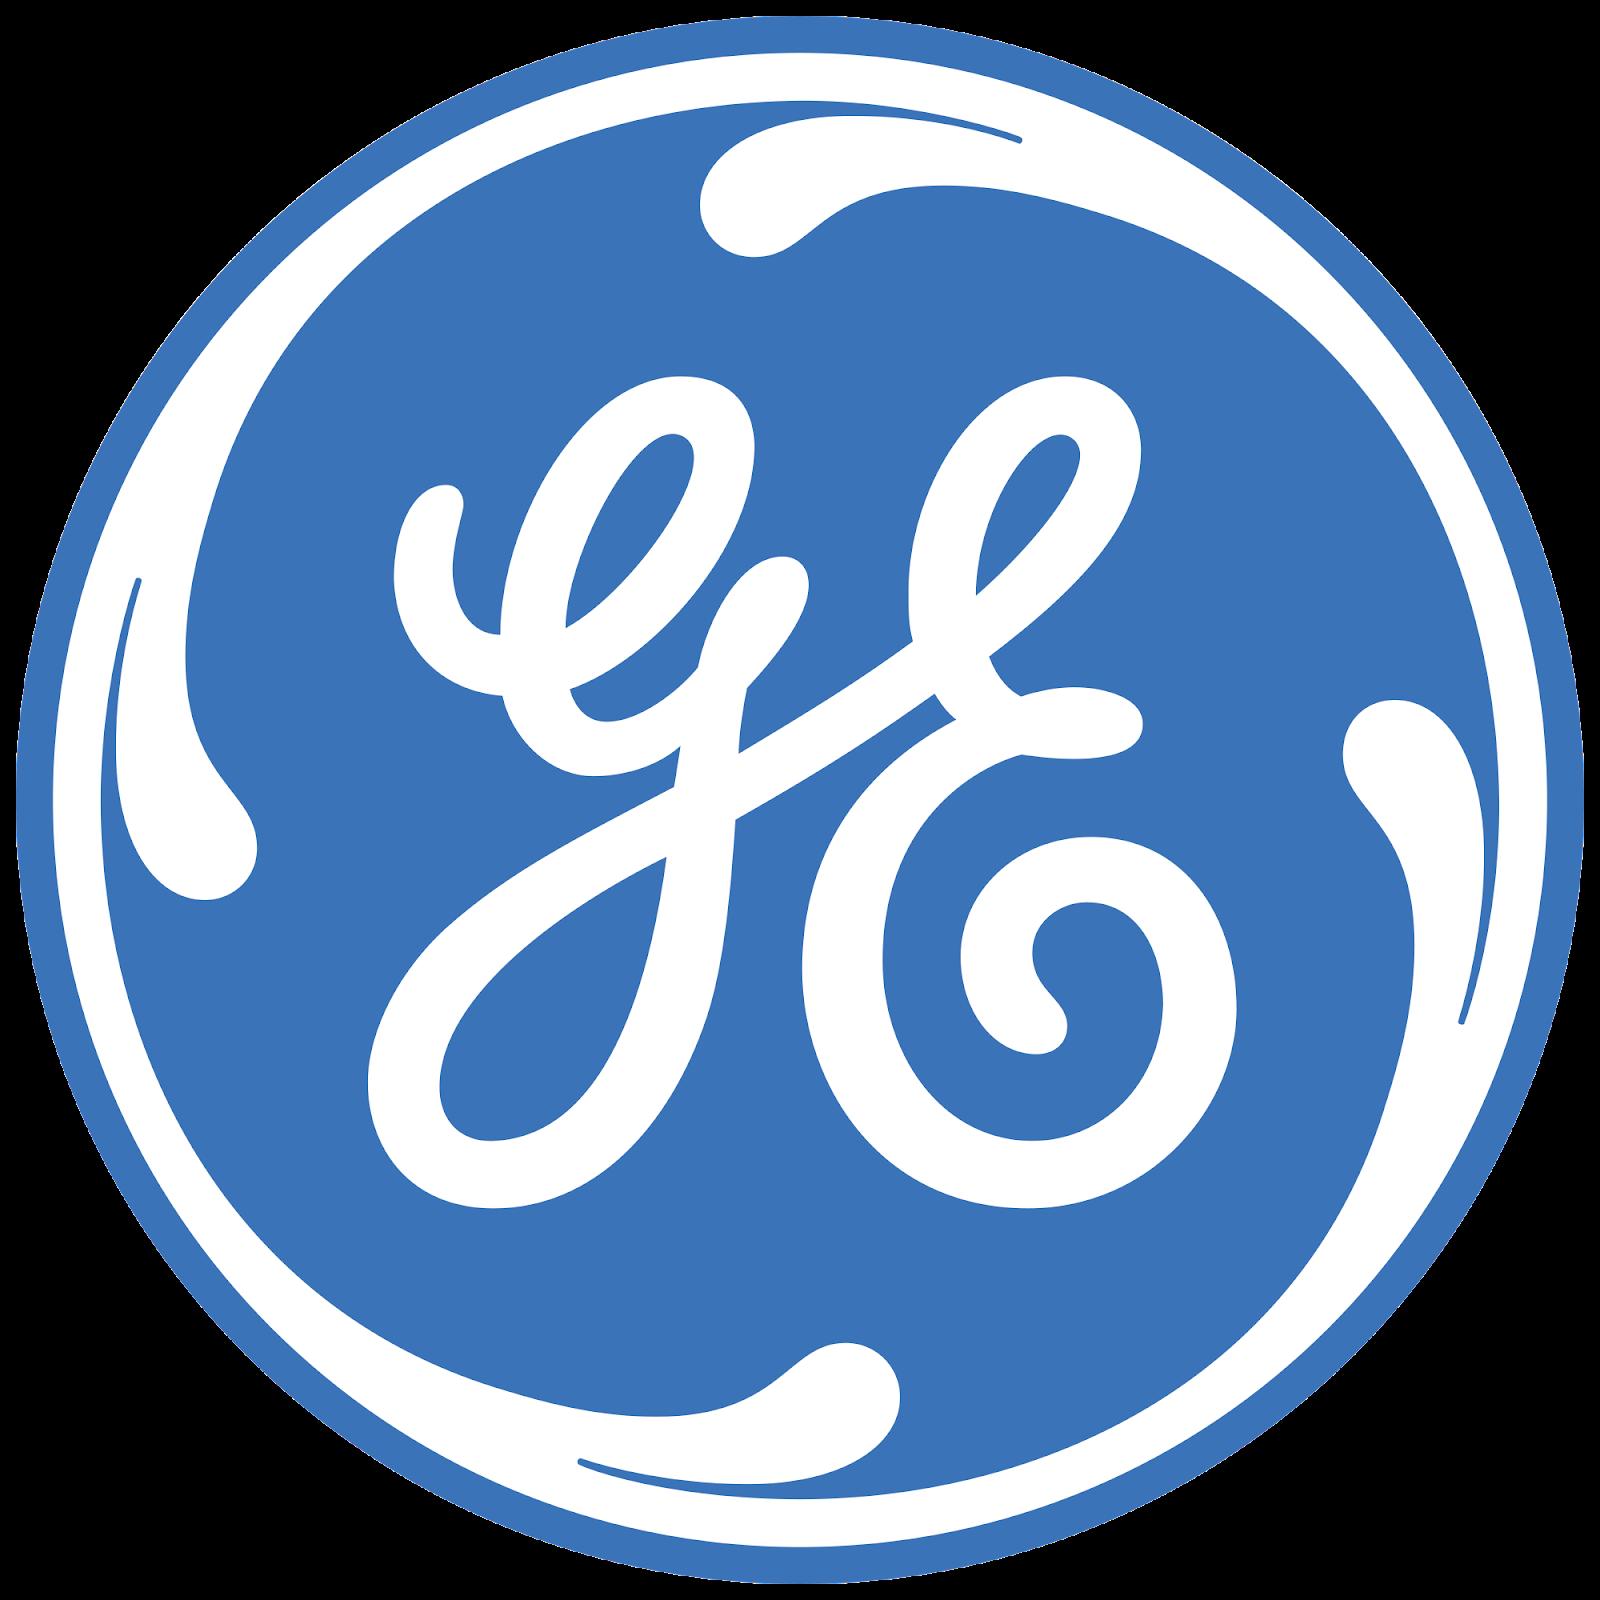 Anwendung der Lean Startup Methode bei General Electric.